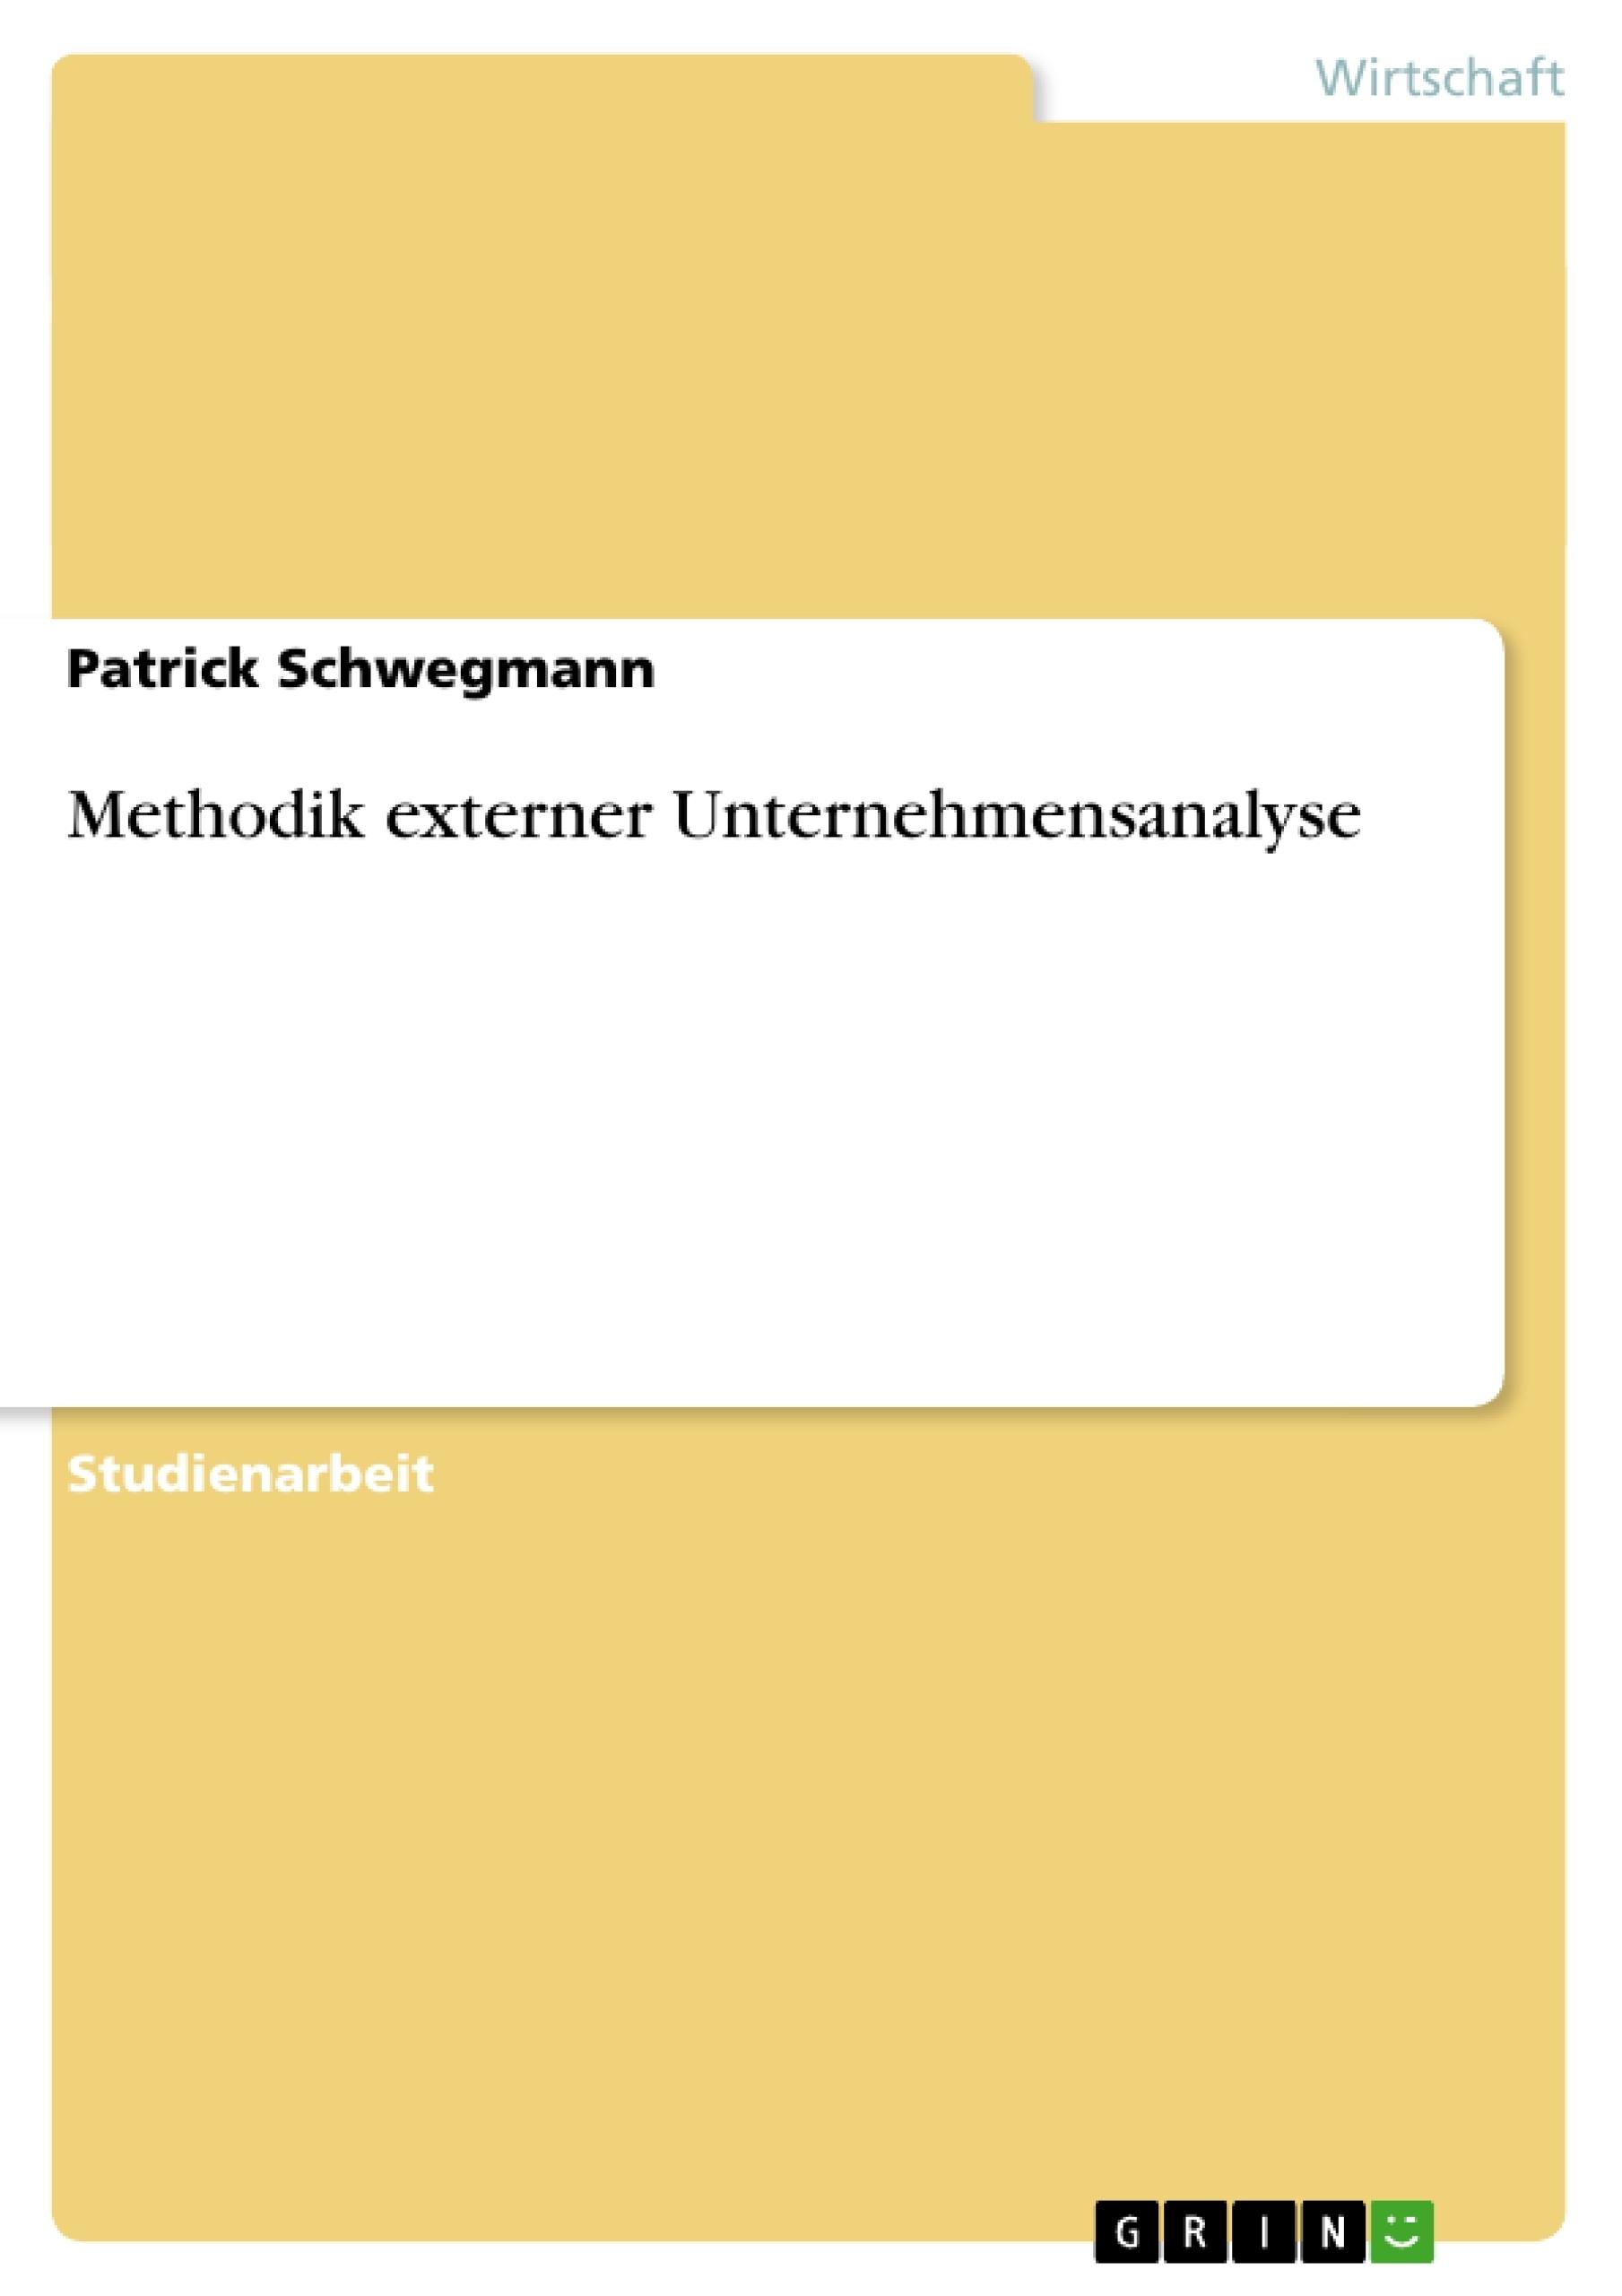 Titel: Methodik externer Unternehmensanalyse